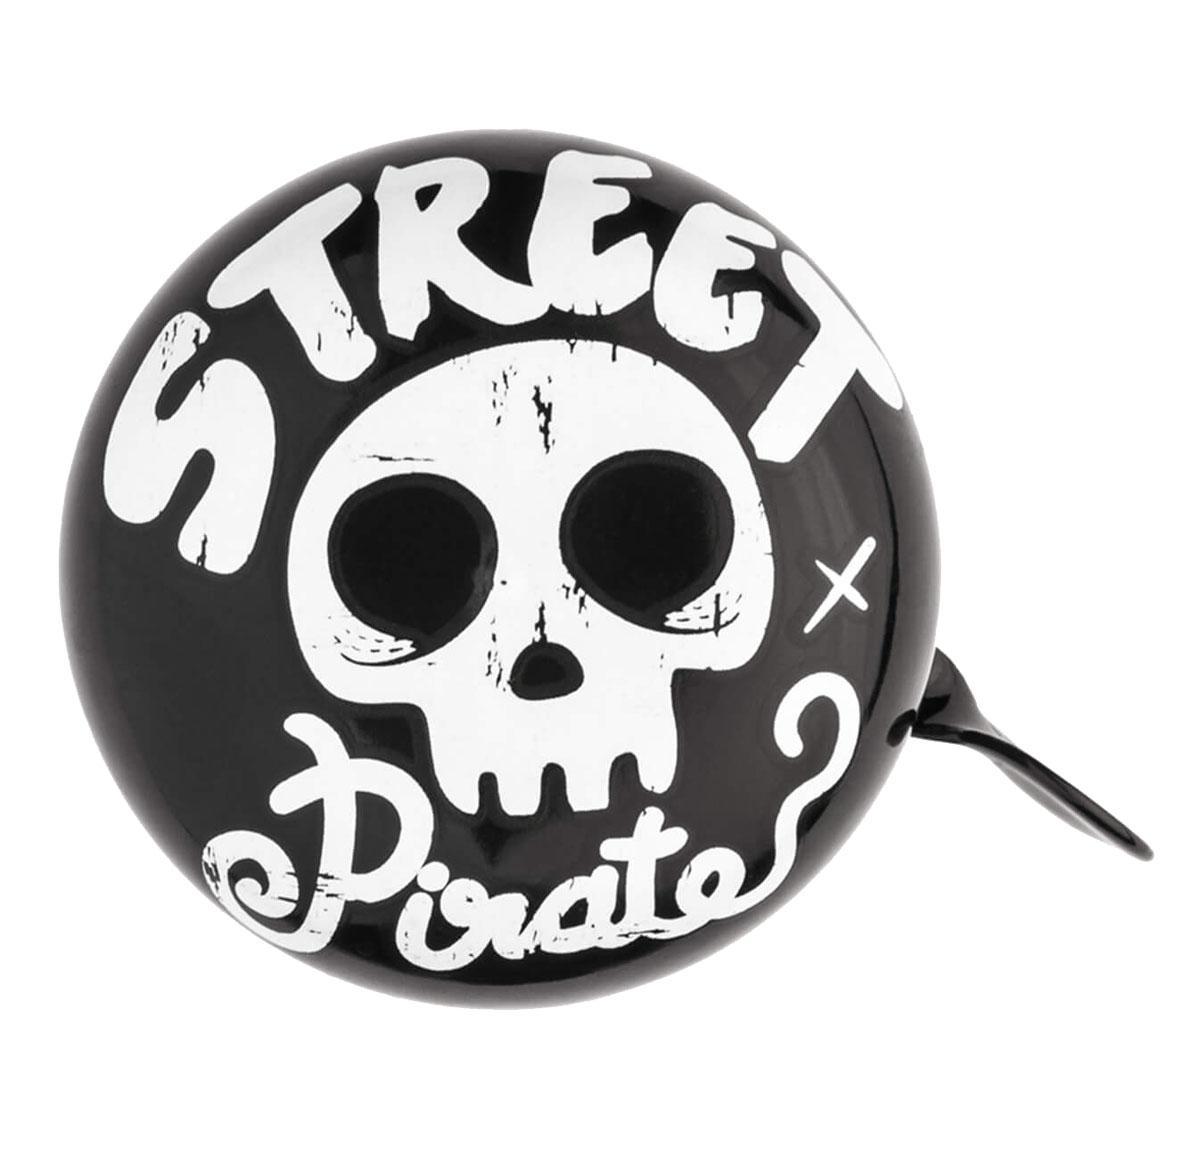 Zvono za Bicikle STREET PIRATE